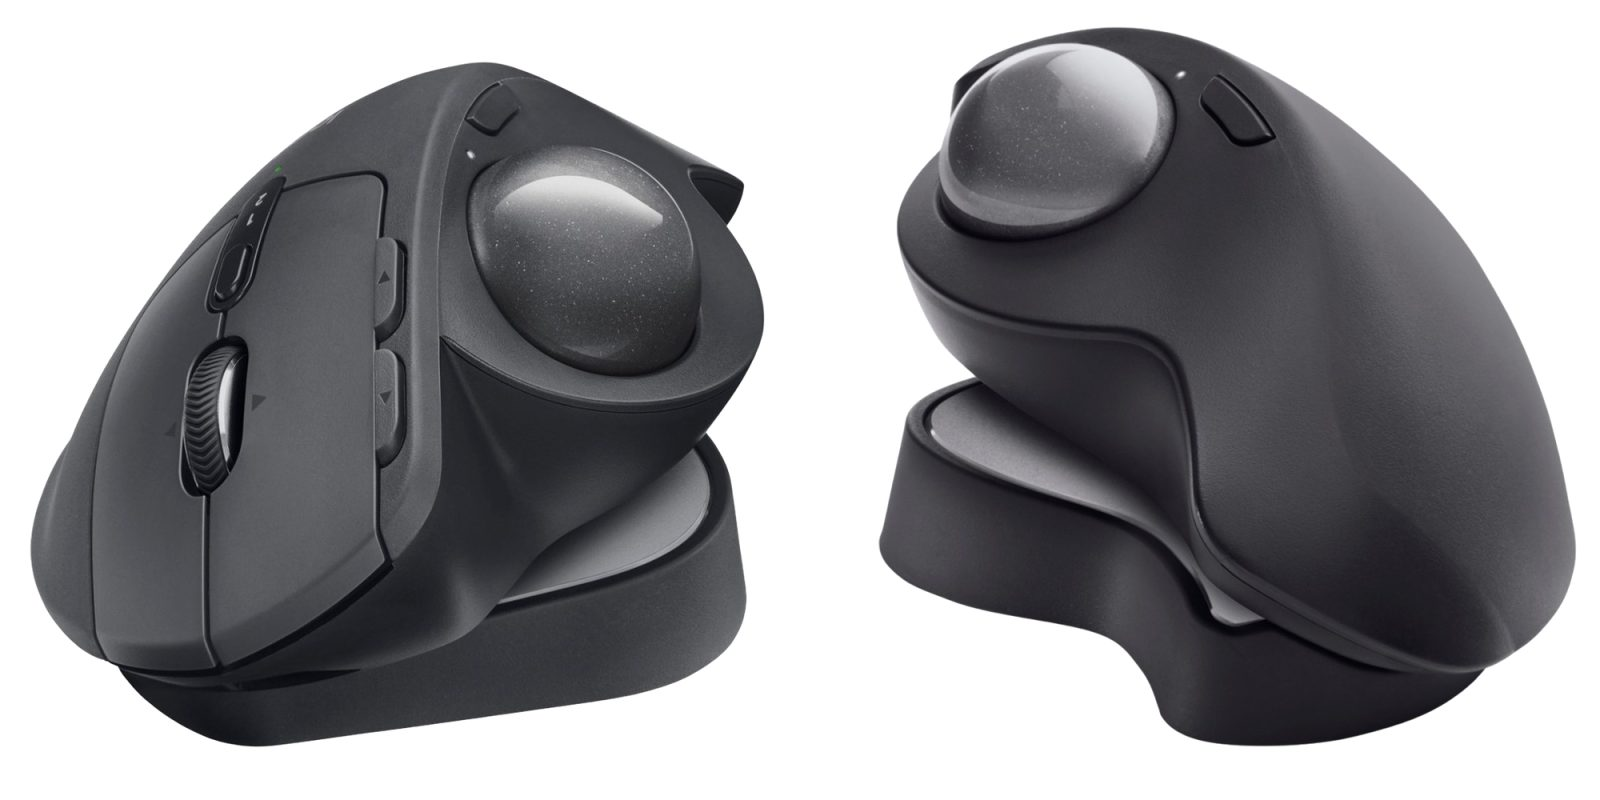 a5e7a777523 Add Logitech's MX ERGO Plus Trackball Mouse to your Mac setup at $80  shipped (20% off)